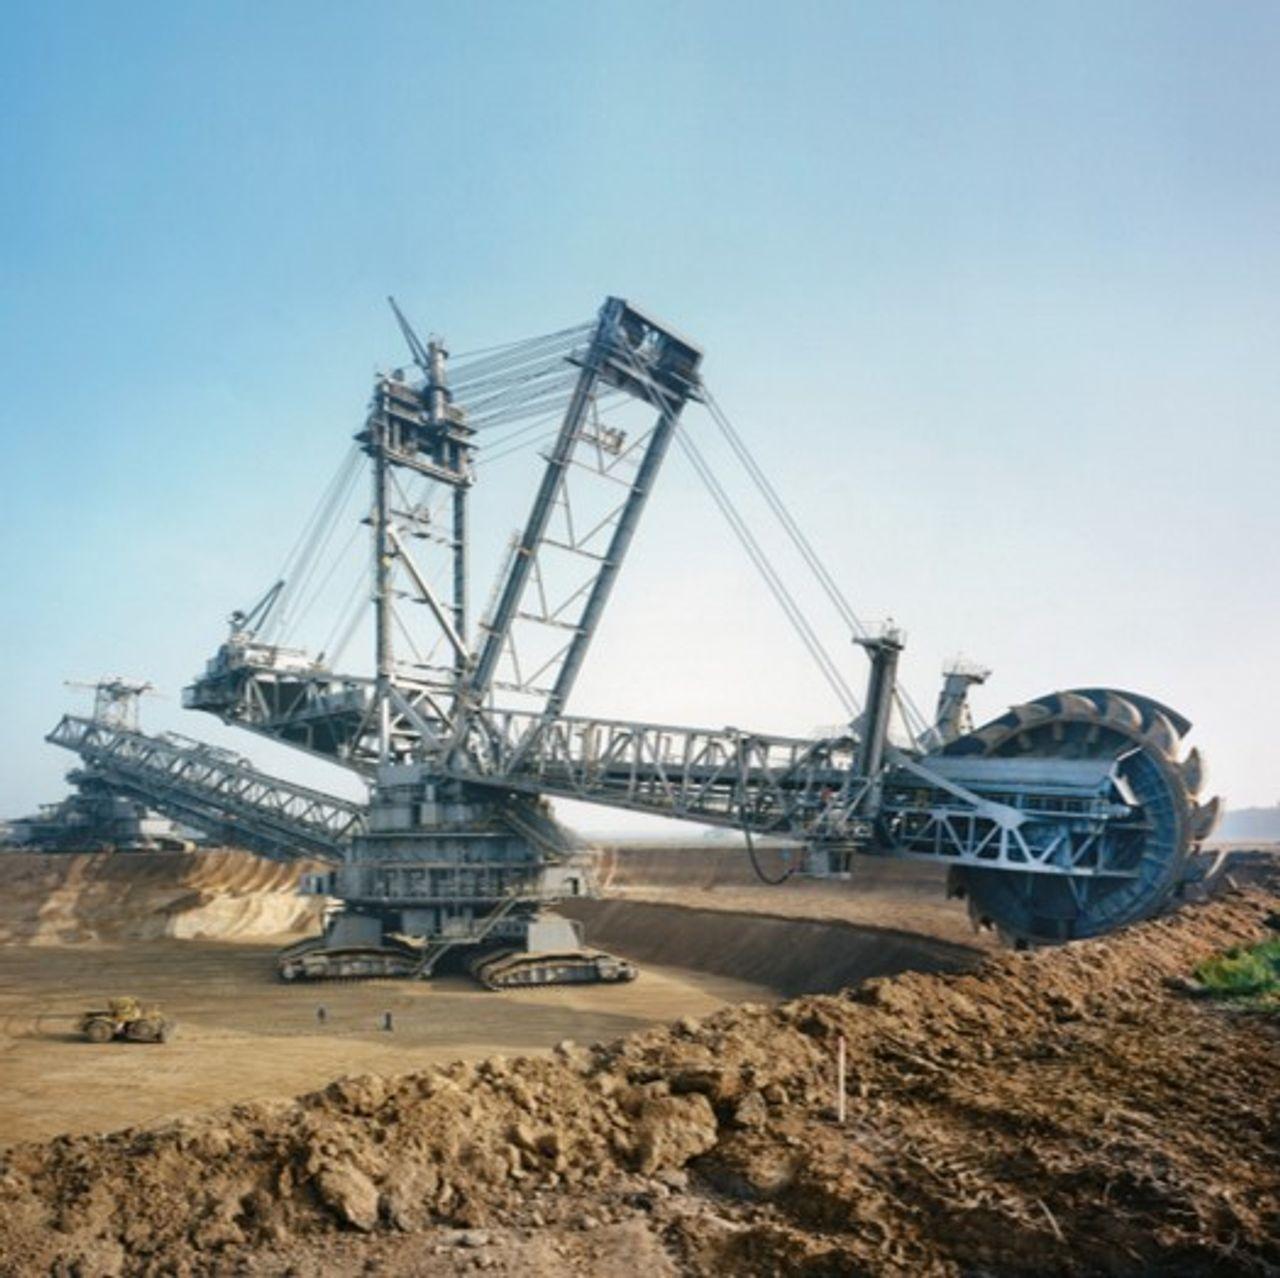 thyssenkrupp Industrial Solutions in Australia